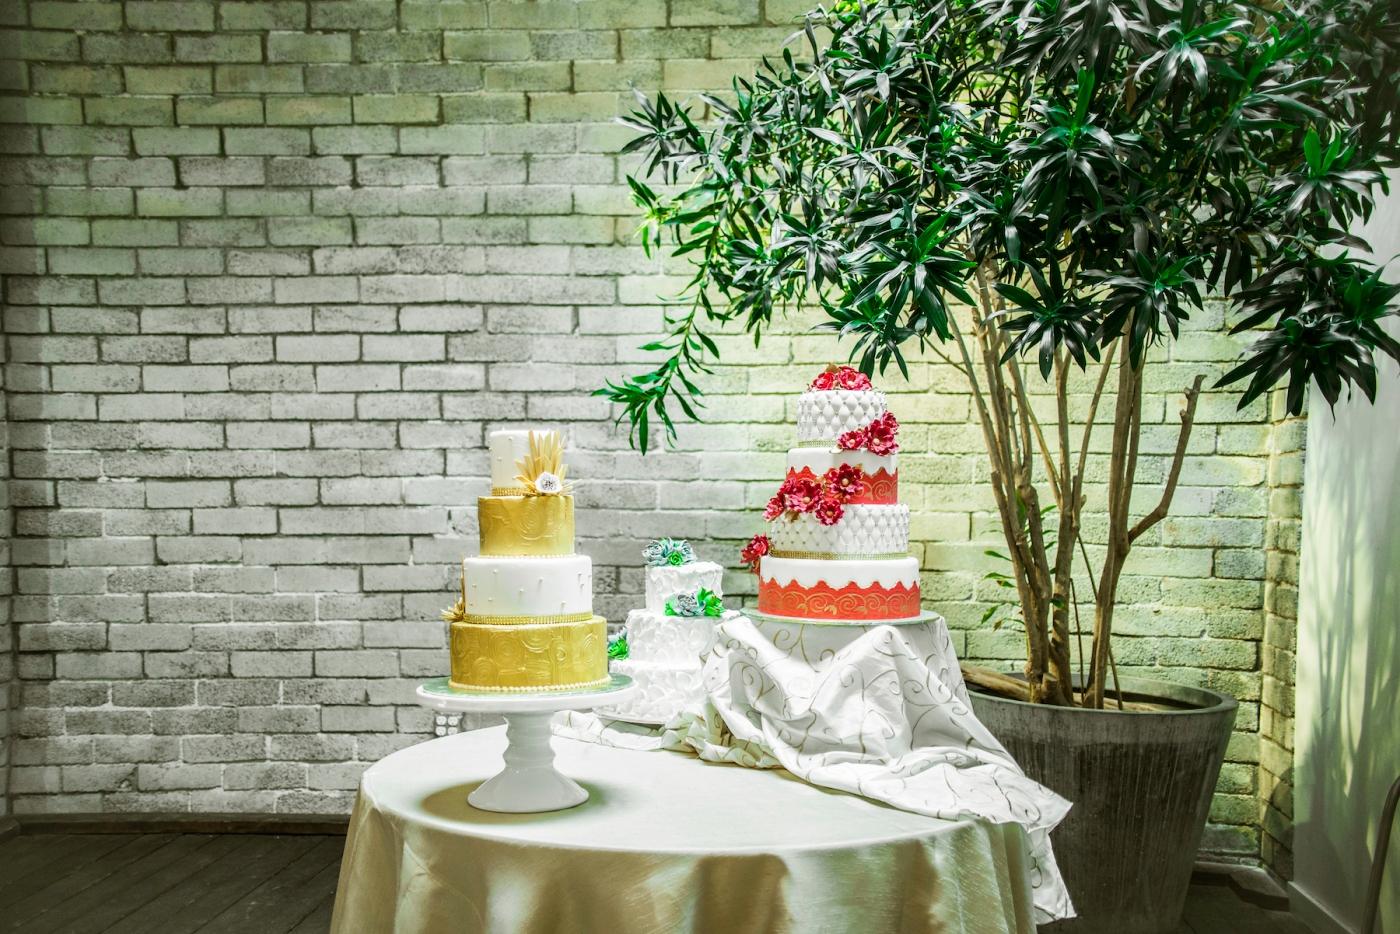 2photography_by_jane_speleers_2017_wedding_show_i_do_sodo_within_designed_by_melody_davisdsc_0196